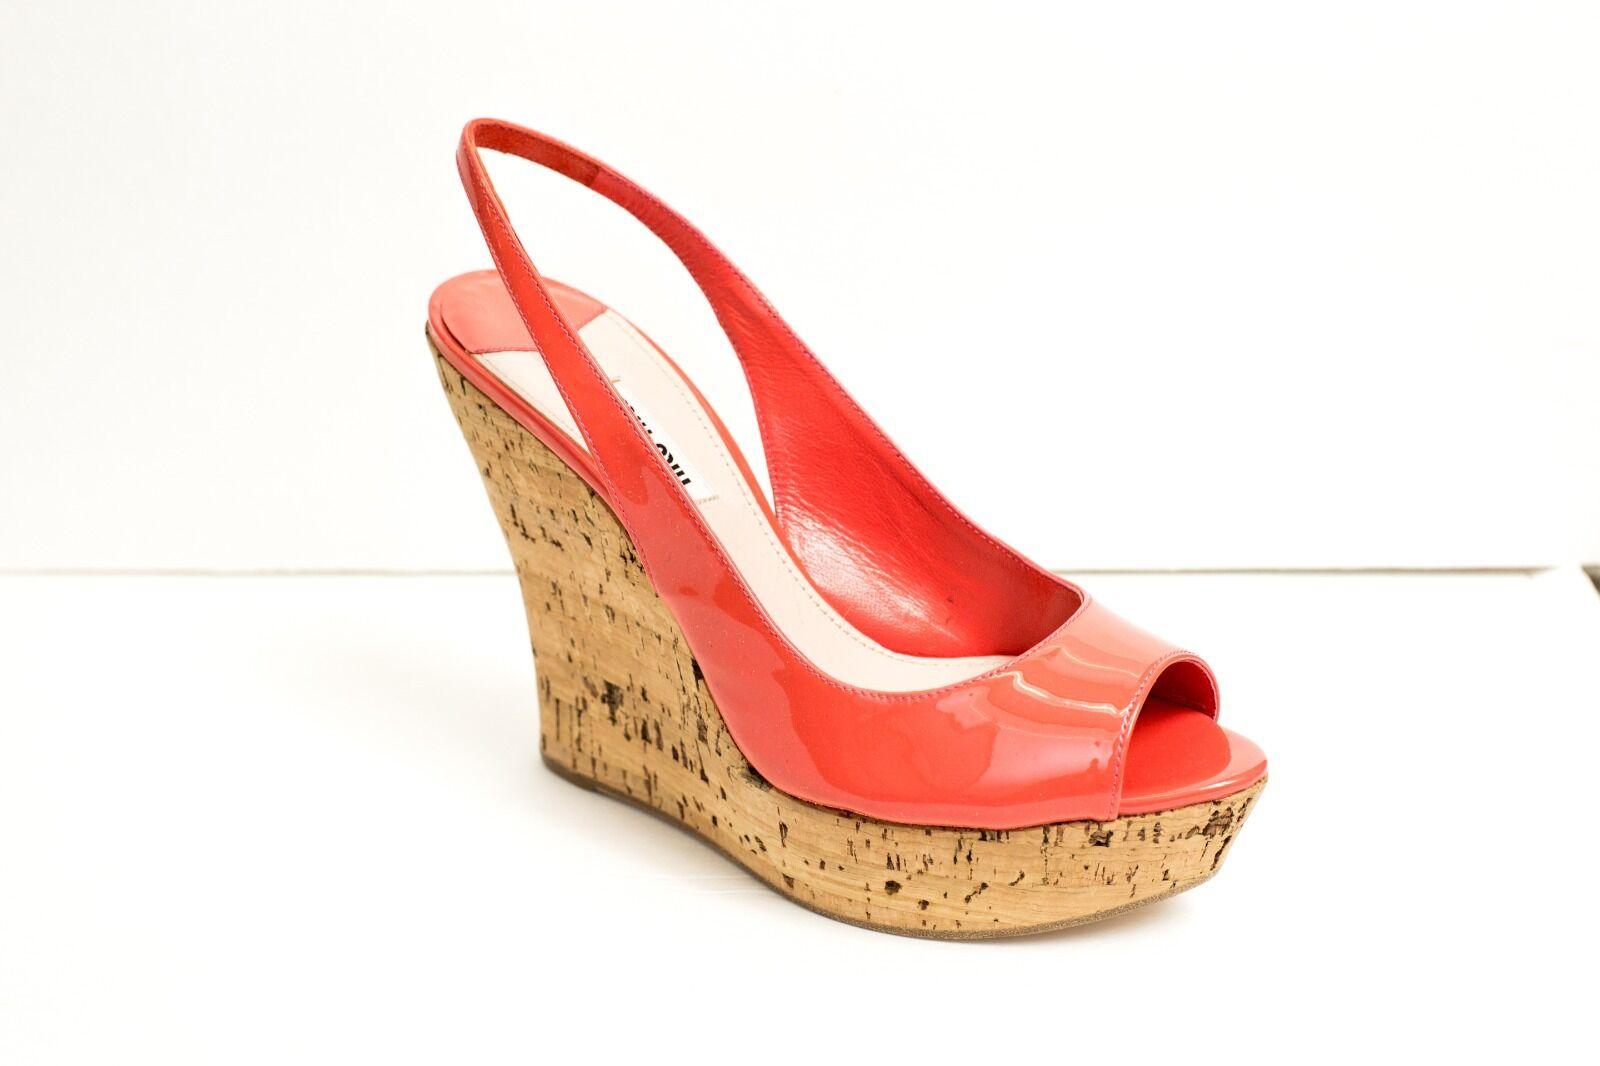 Miu Miu Zapatos Sandalias Tacones Coral Charol ESLINGA ESLINGA ESLINGA vuelta Cuñas 10 40  los clientes primero